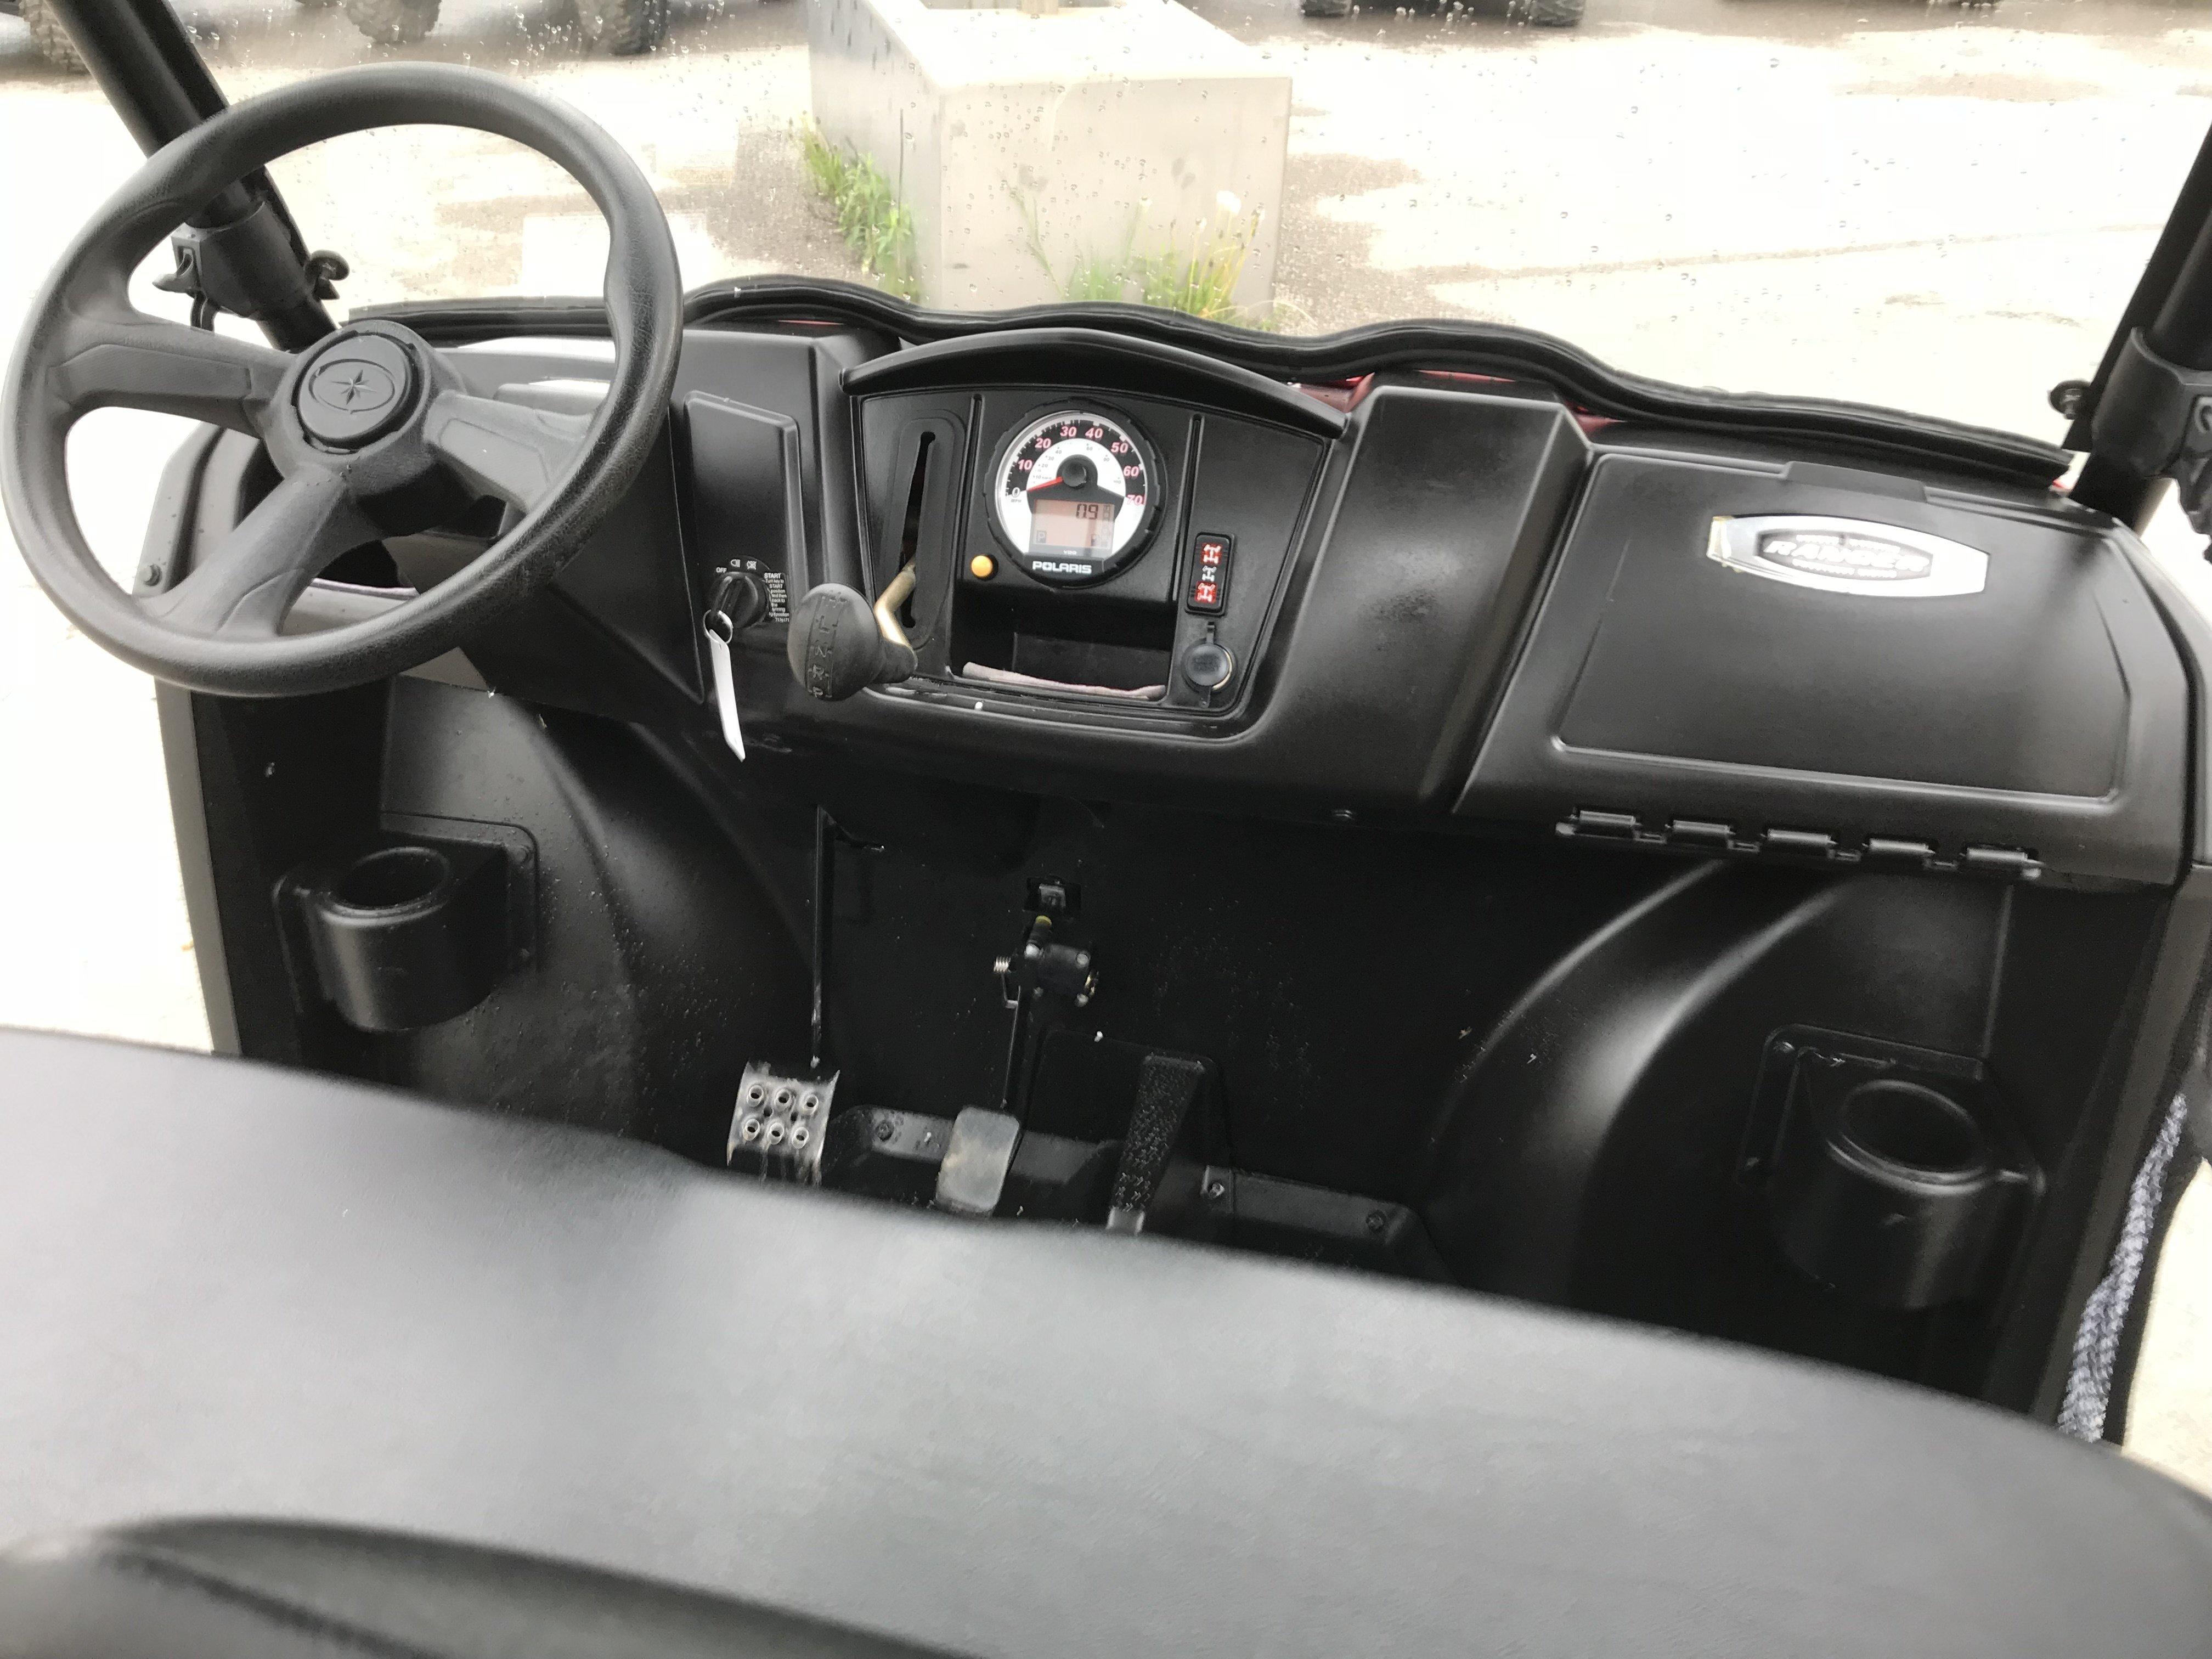 2013 Polaris Ranger 500 EFI Midsize